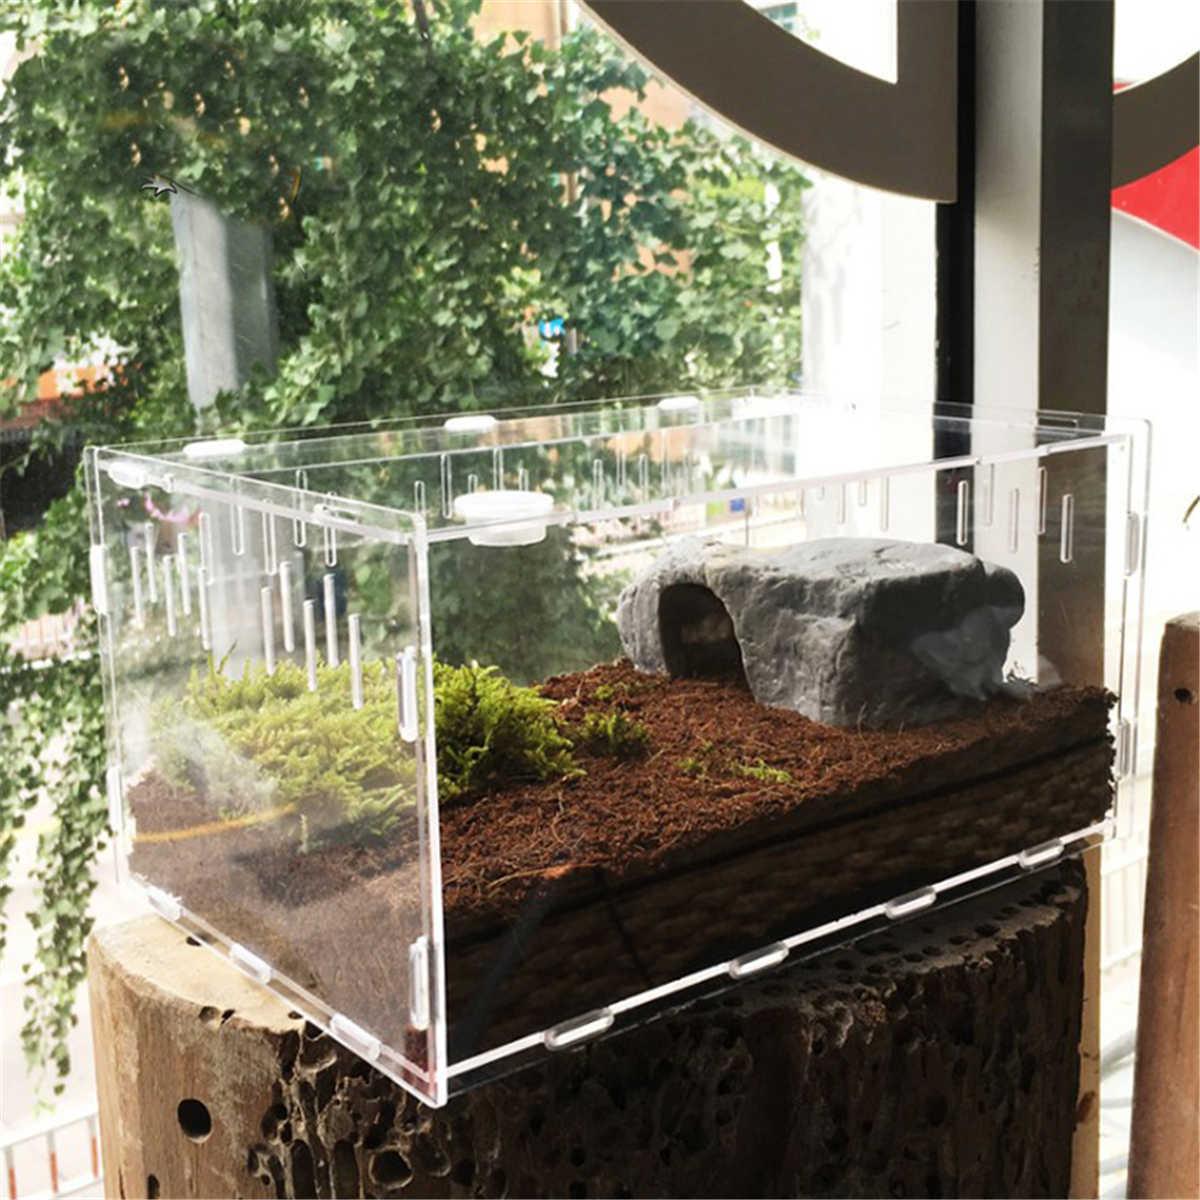 S/L Size Reptile Tank Insect Spiders Tortoise Lizard Acrylic Transparent Breeding Box Vivarium Lid Reptile Pet Product Terrarium